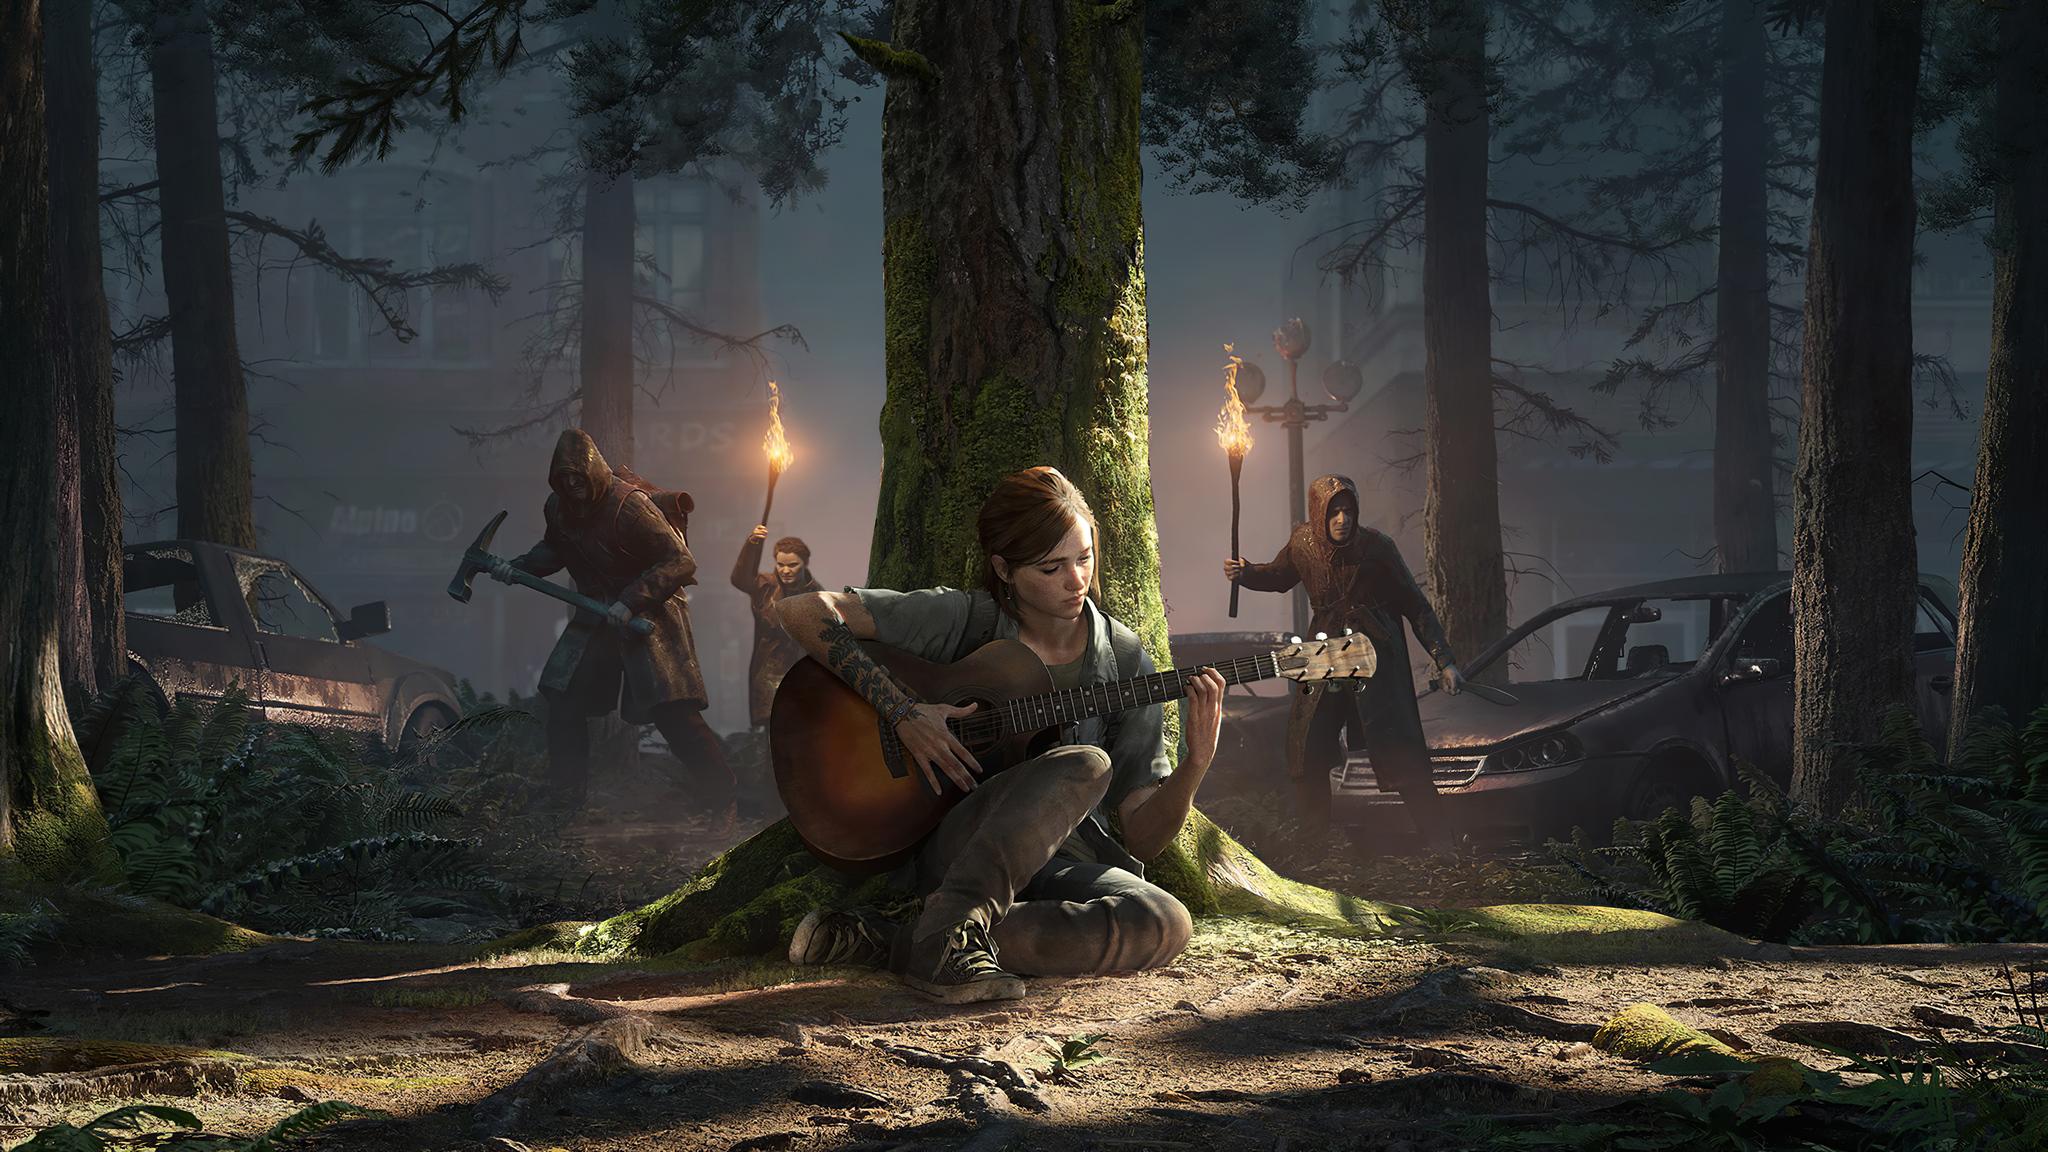 2048x1152 Ellie The Last Of Us 4k 2048x1152 Resolution HD ...